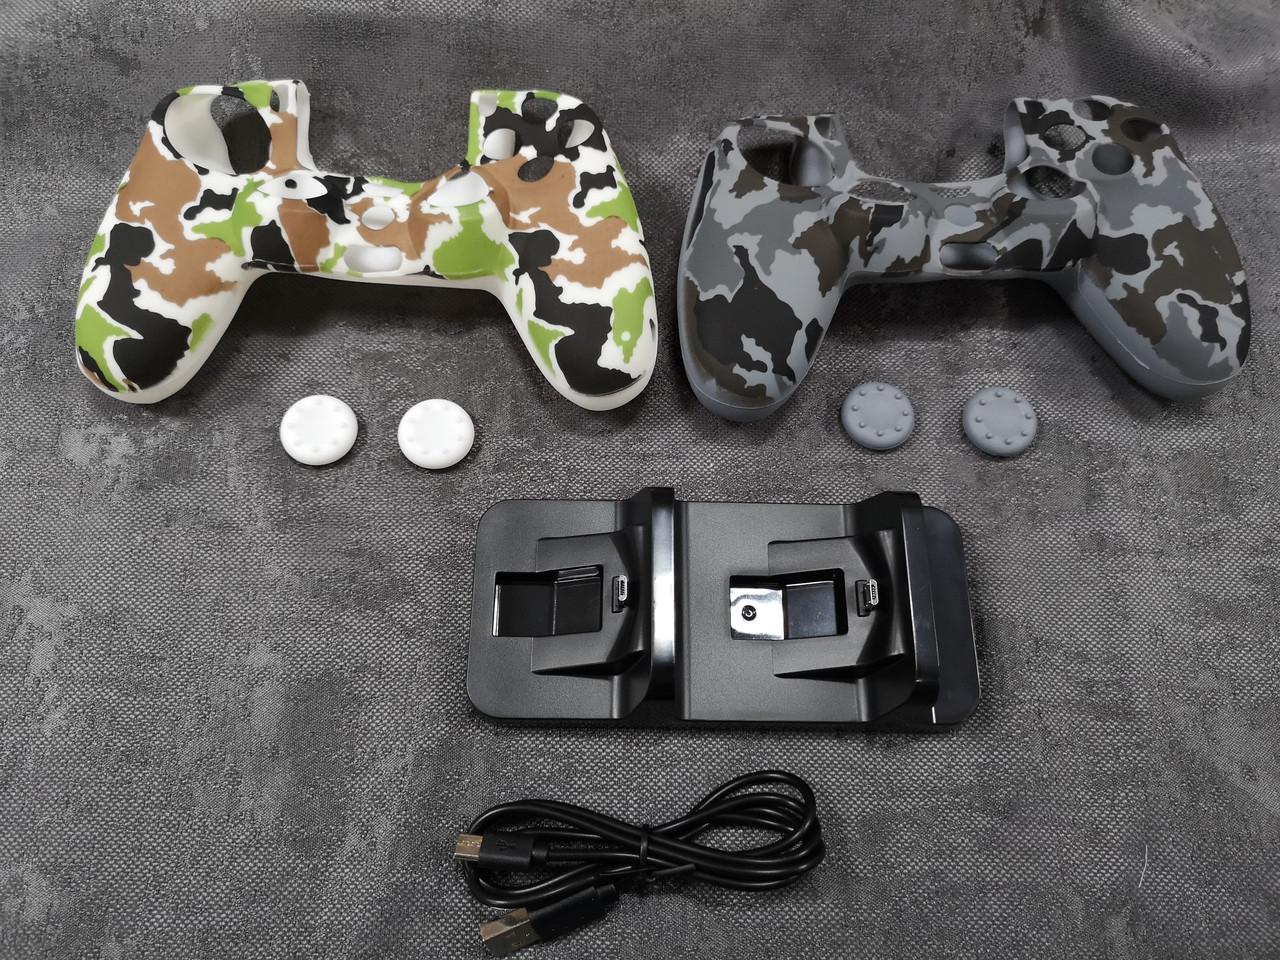 Darius Box V8 - Набор  2 чехла + 4 накладок  + зарядная станция для Playstation 4